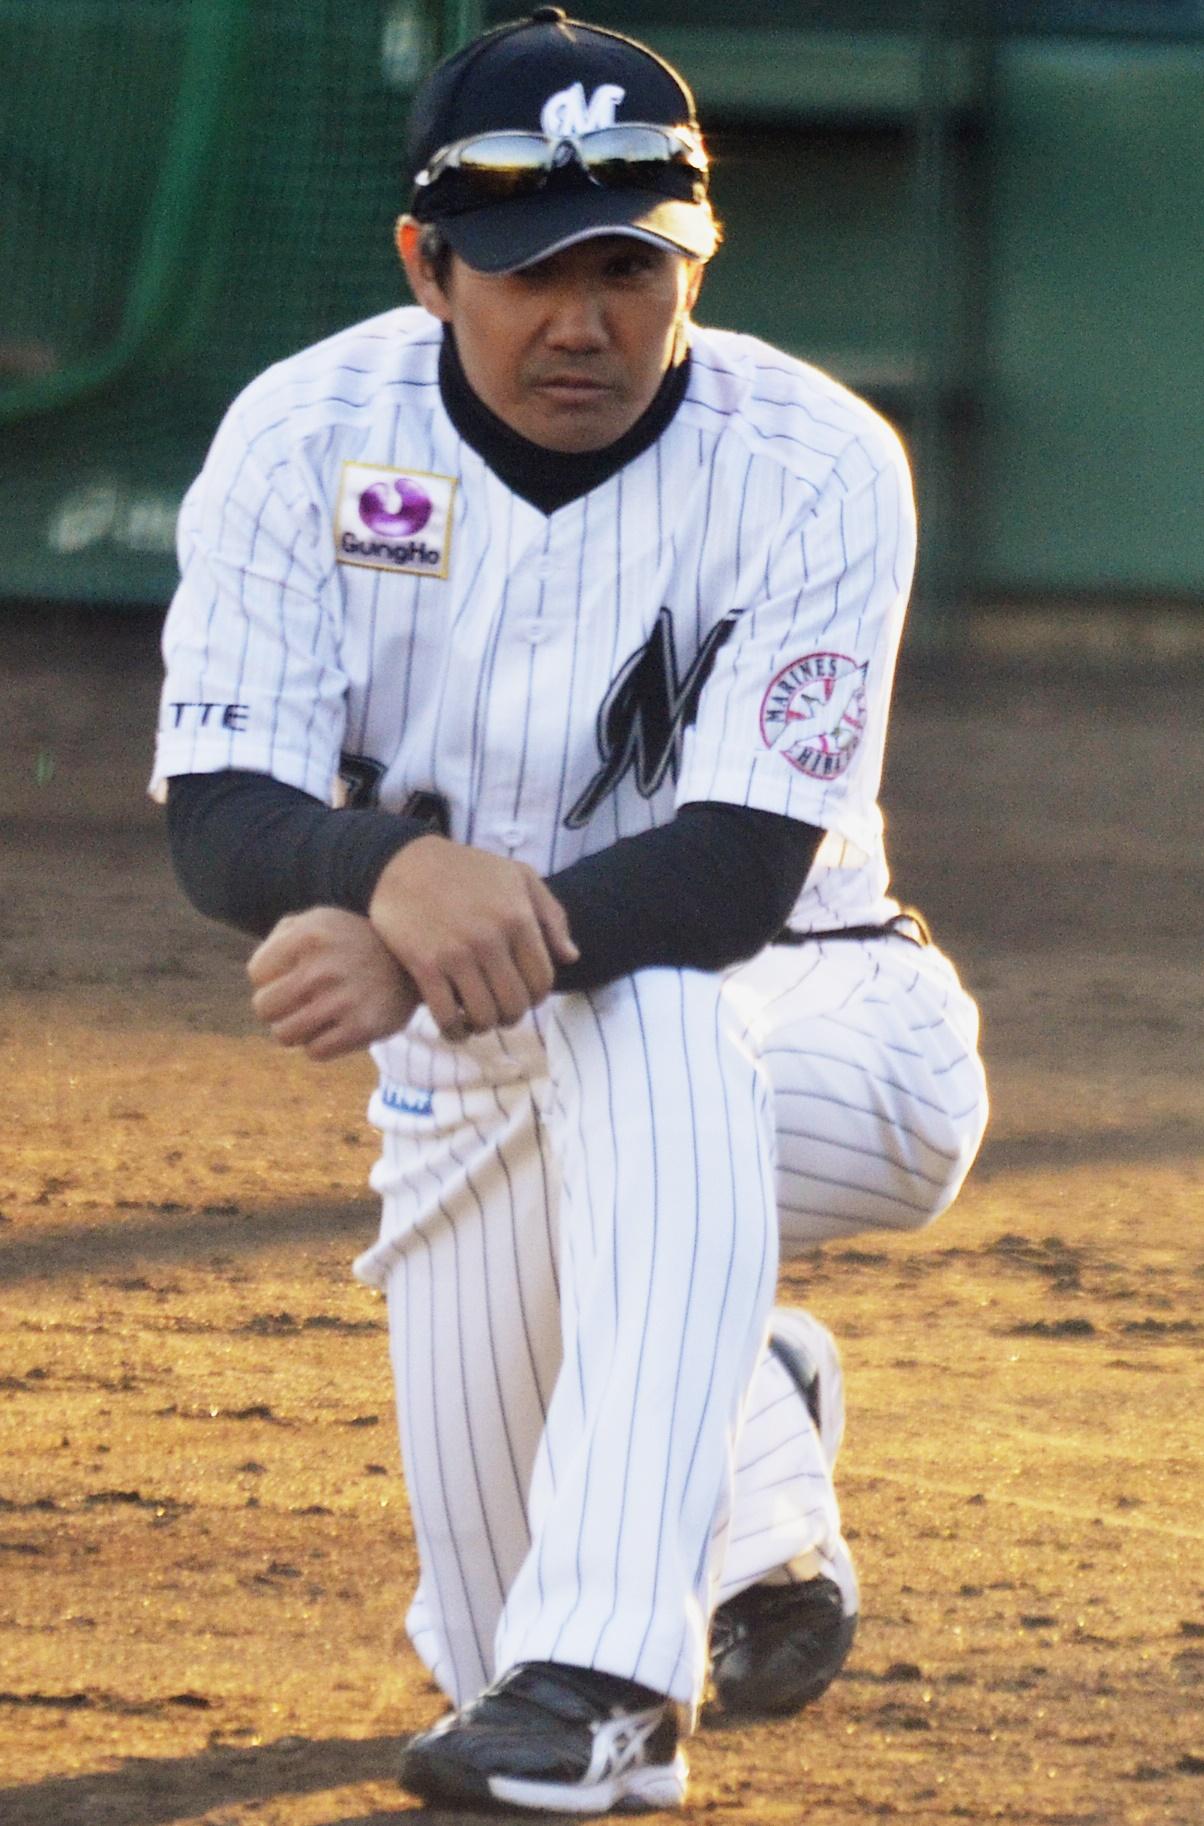 小坂誠 - Wikipedia